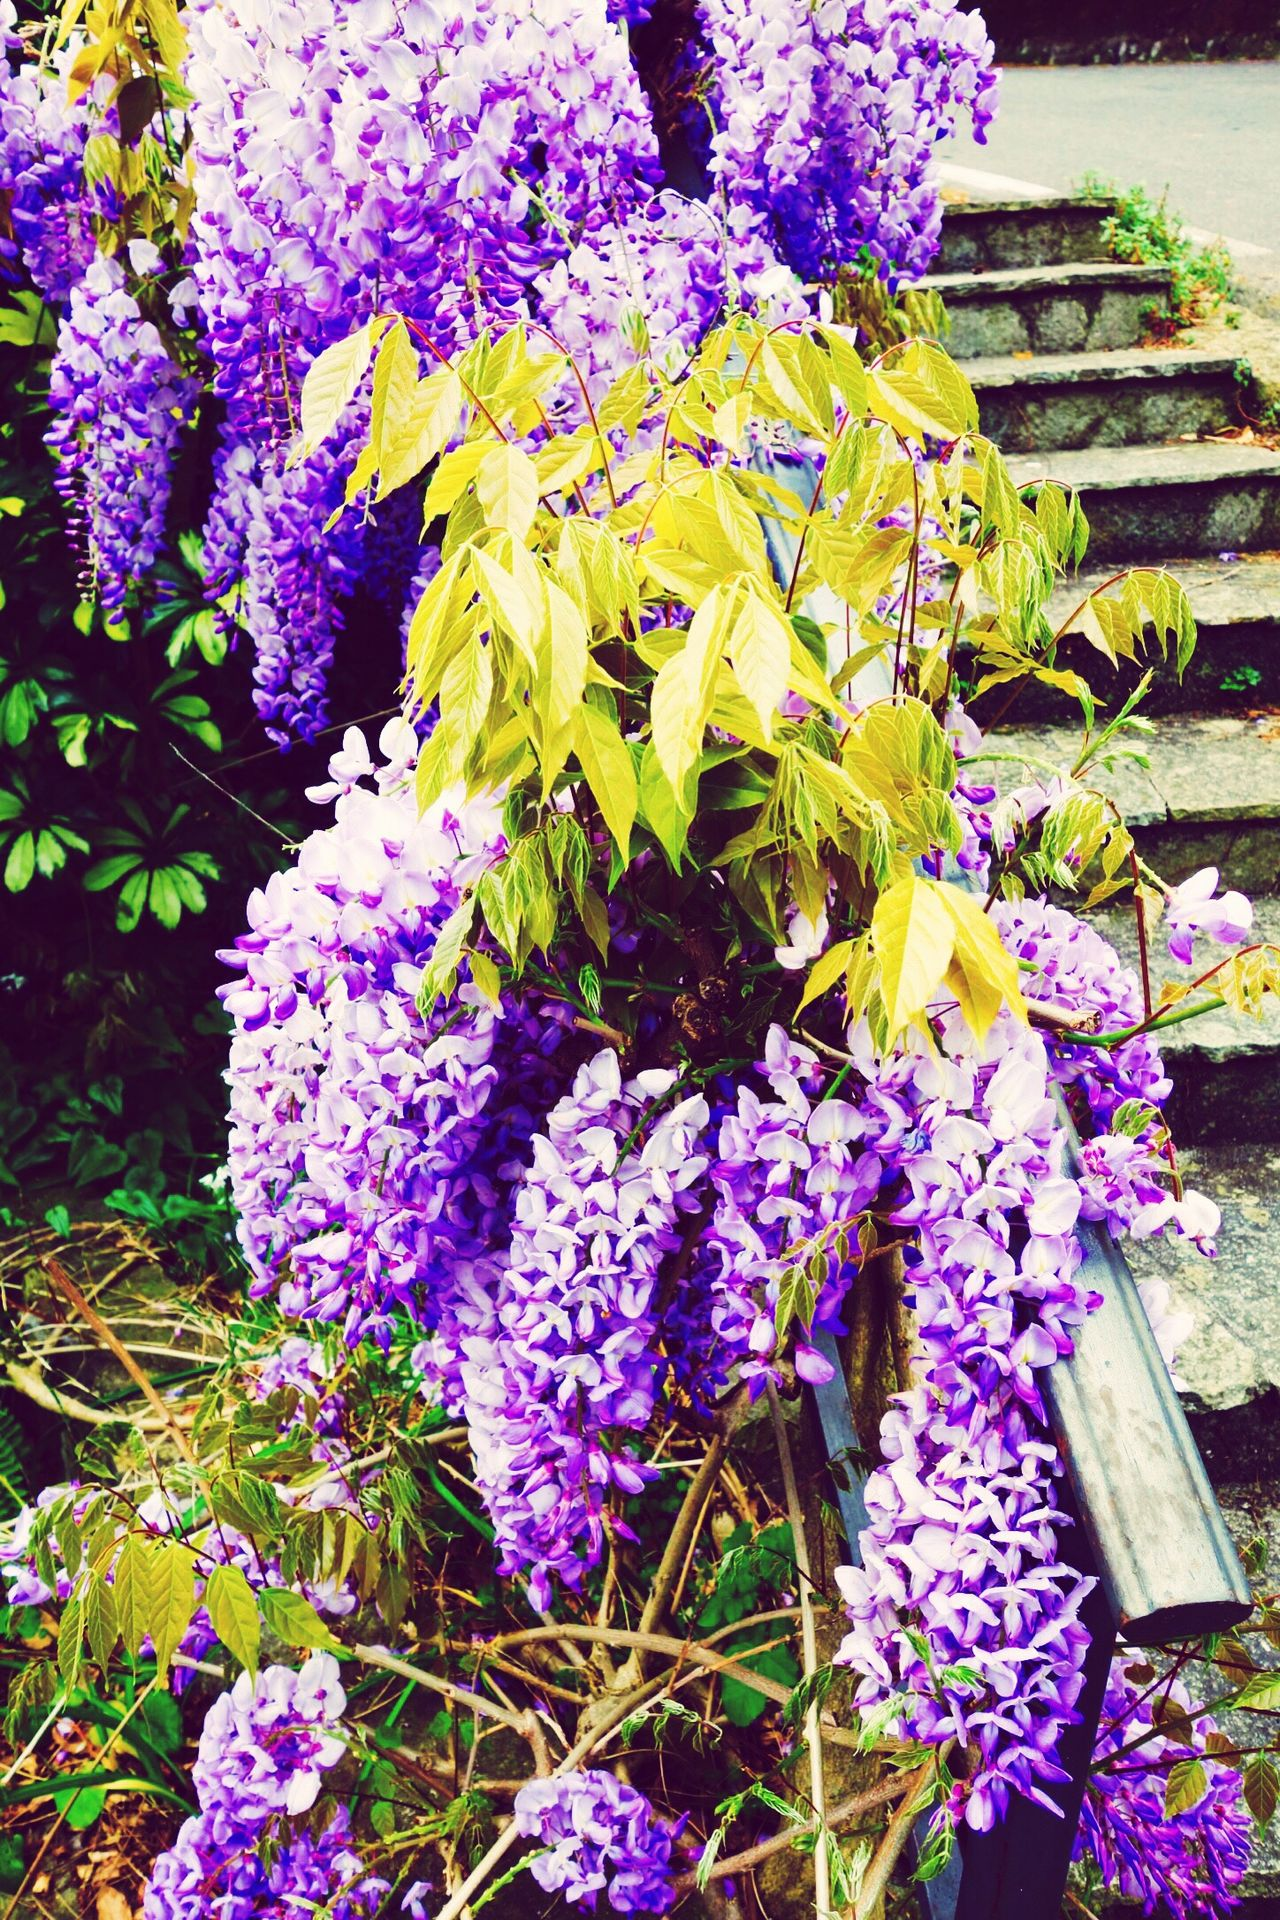 Wisteria Flower Wisteria Glicine Glicineinfiore Spring Flowers Spring Flowers Flower Collection Purple Flower